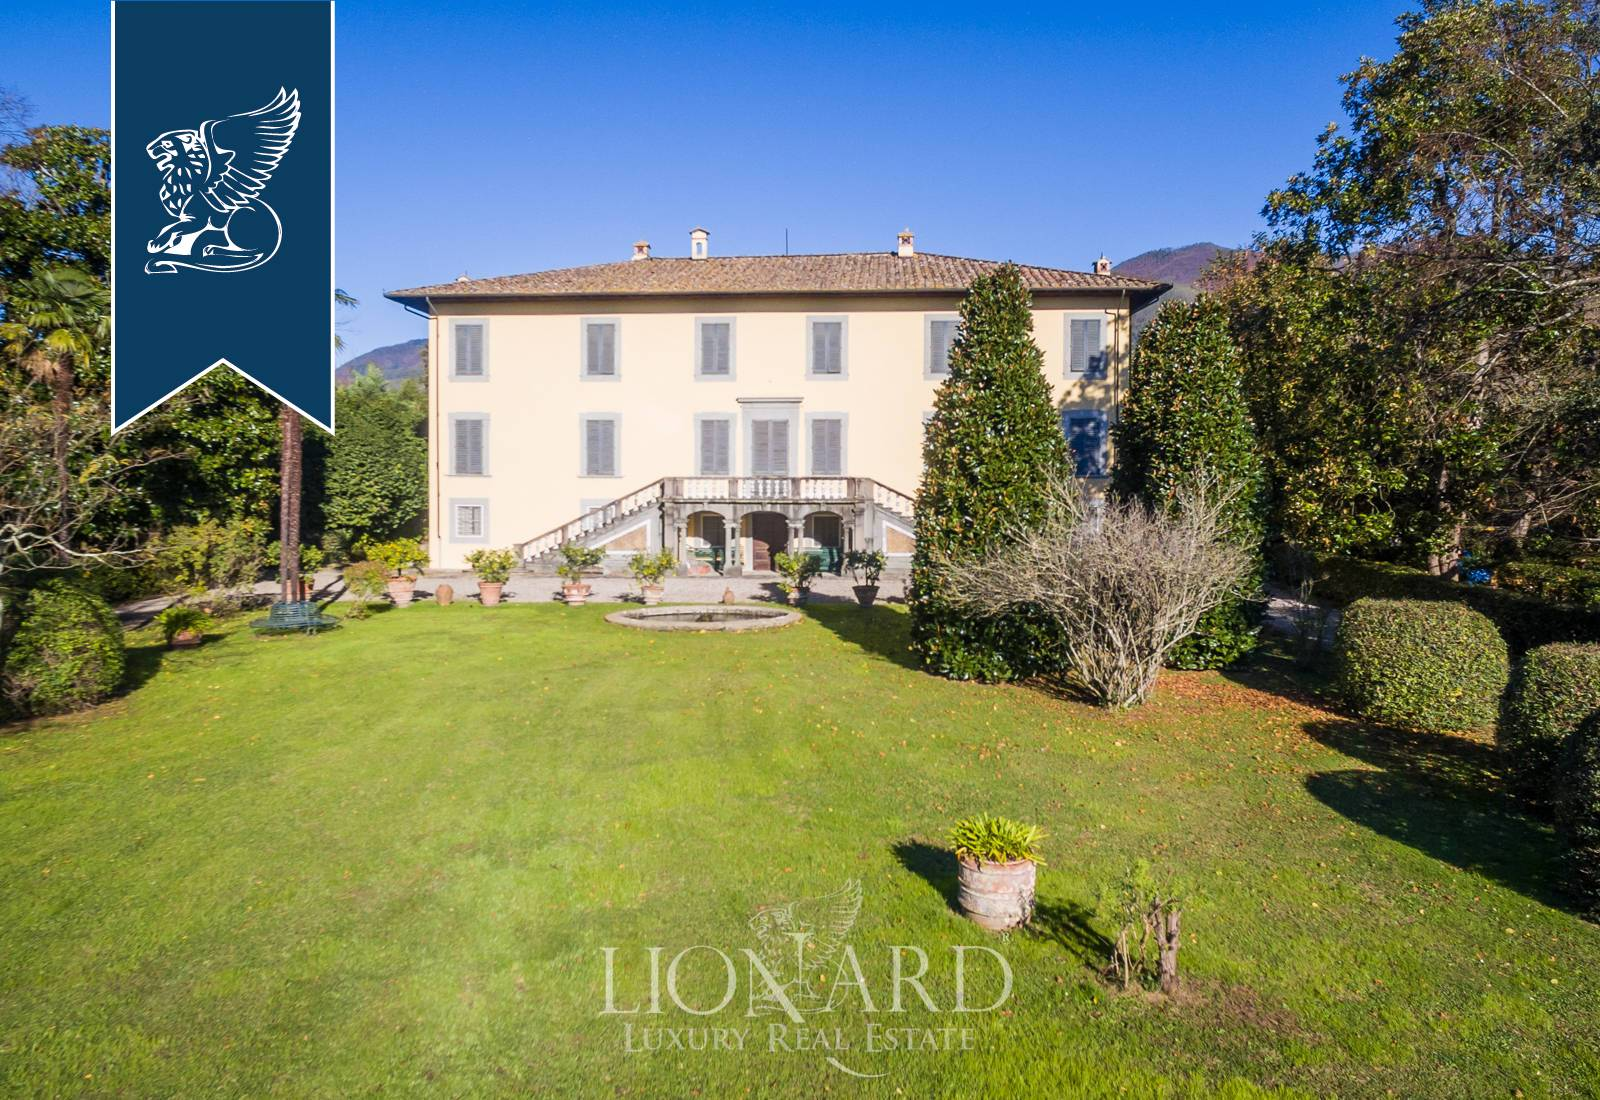 Villa in Vendita a Capannori: 0 locali, 1200 mq - Foto 1